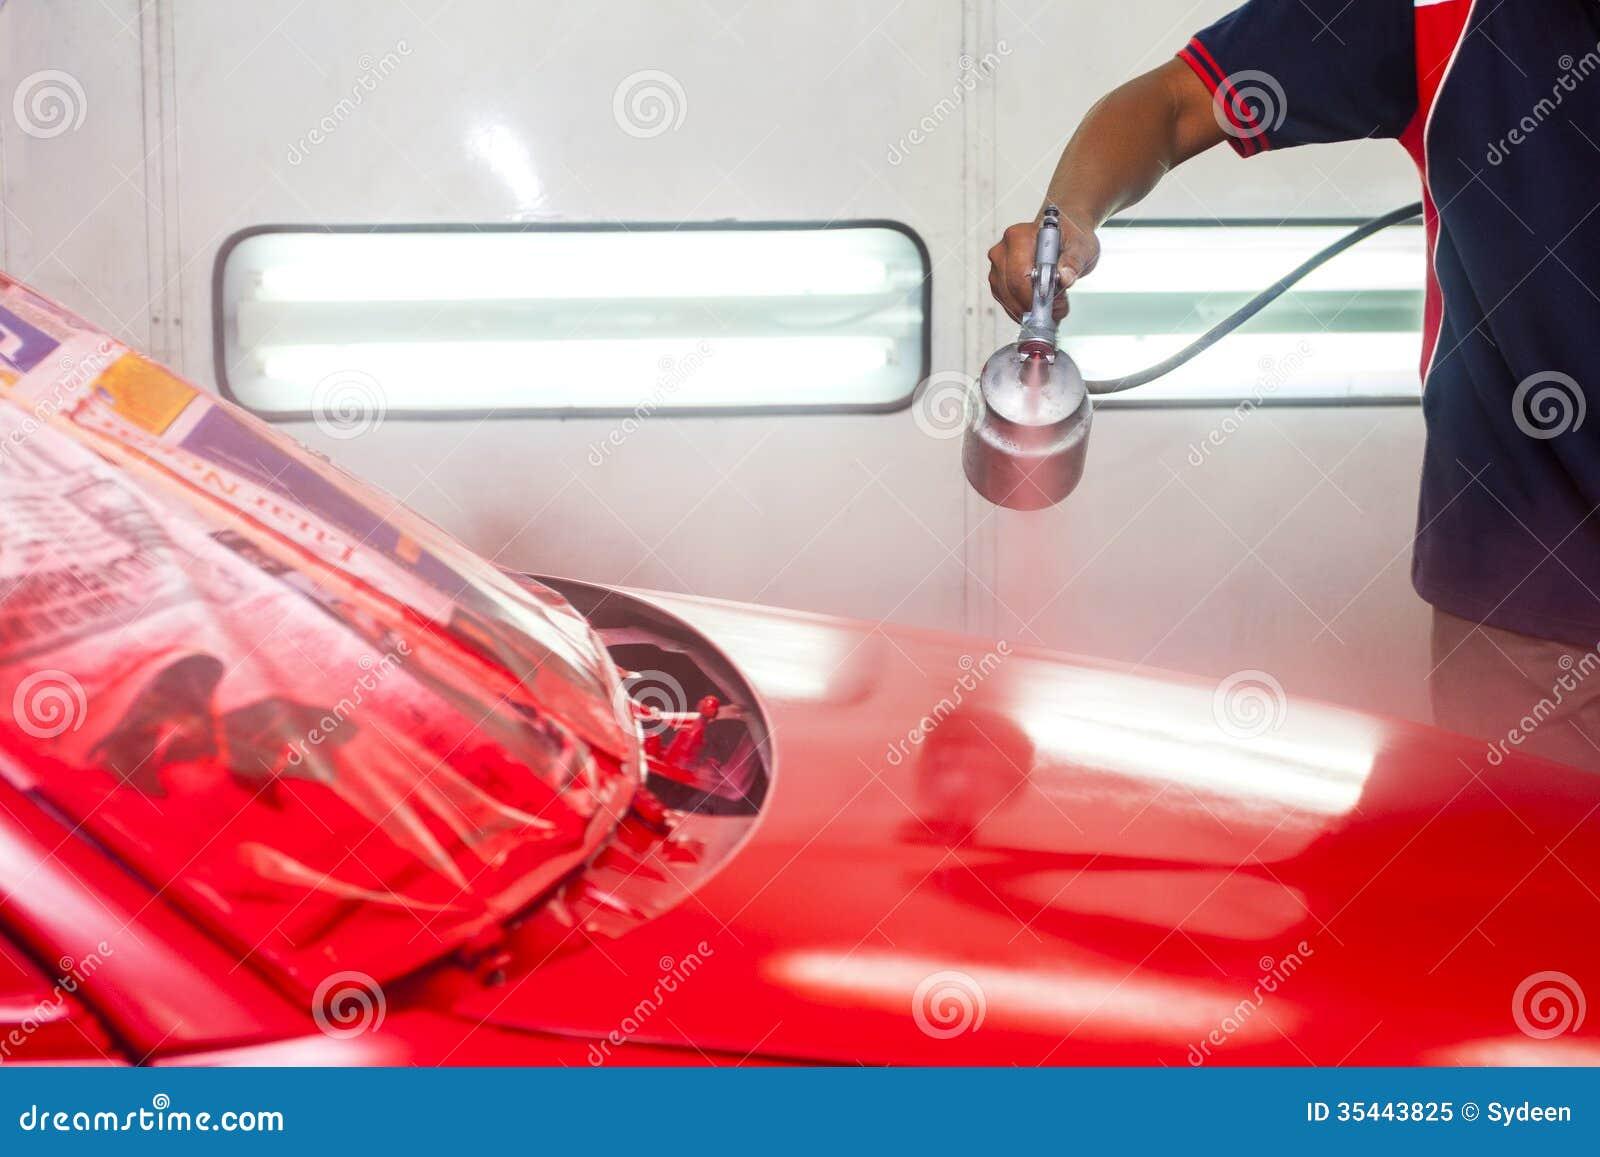 Car painting work